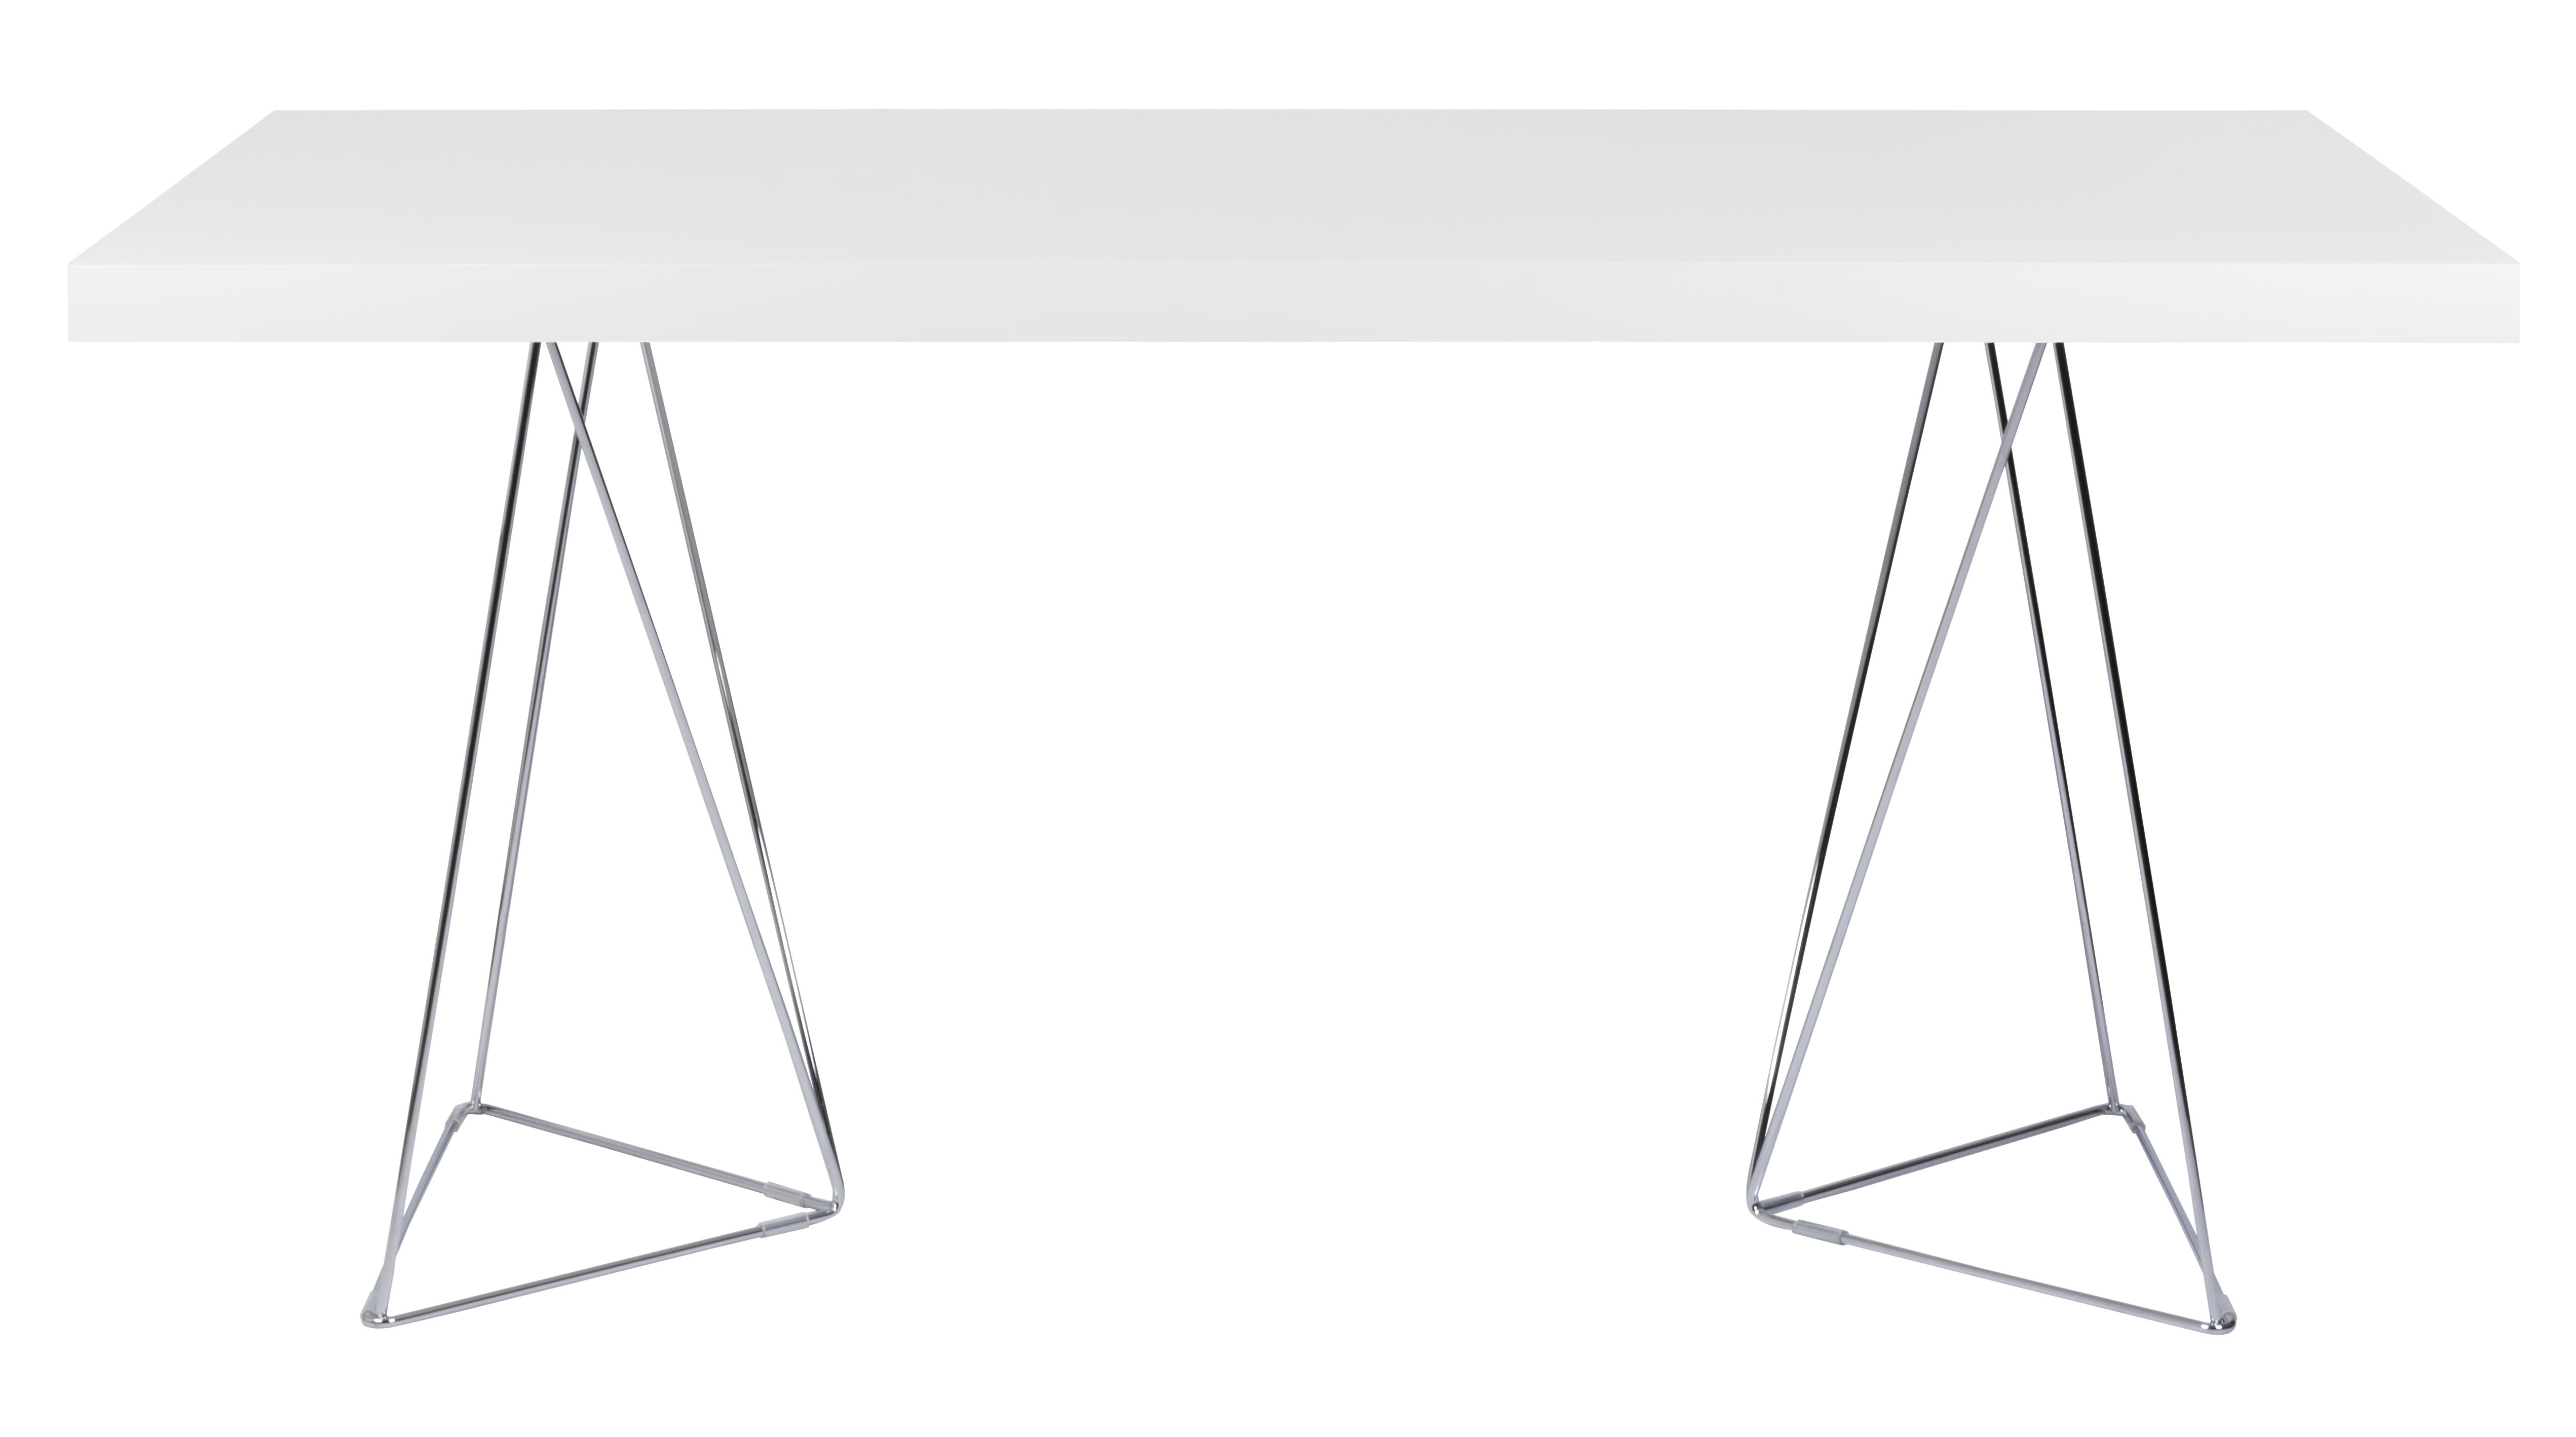 Möbel - Büromöbel - Trestle rechteckiger Tisch / L 160 cm - POP UP HOME - L 160 cm / weiß & chrom-glänzend - Spanplatte, verchromtes Metall